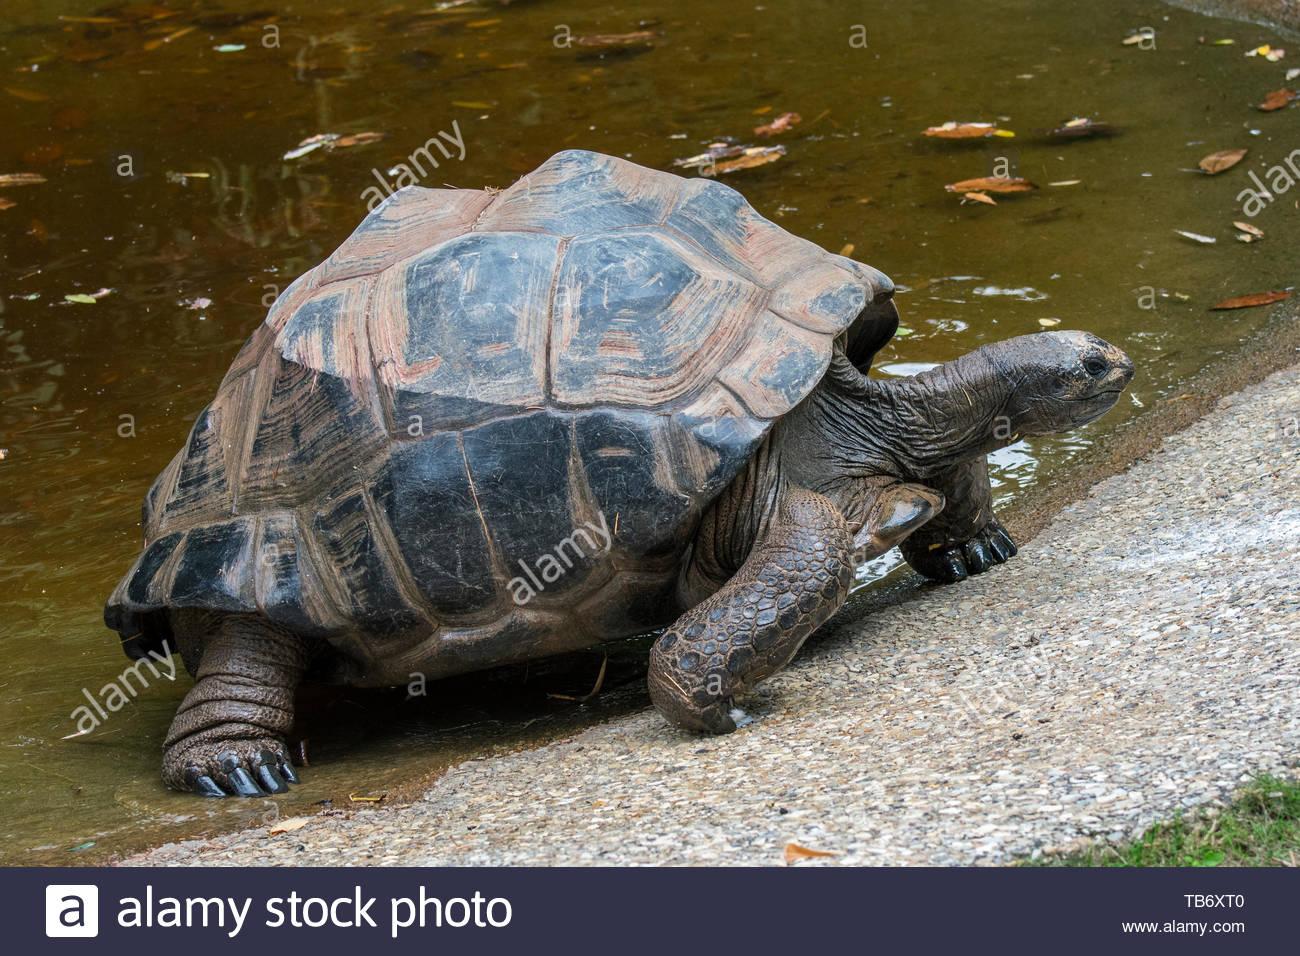 Aldabra giant tortoise (Aldabrachelys gigantea / Testudo gigantea) native to the islands of the Aldabra Atoll in the Seychelles leaving pond - Stock Image